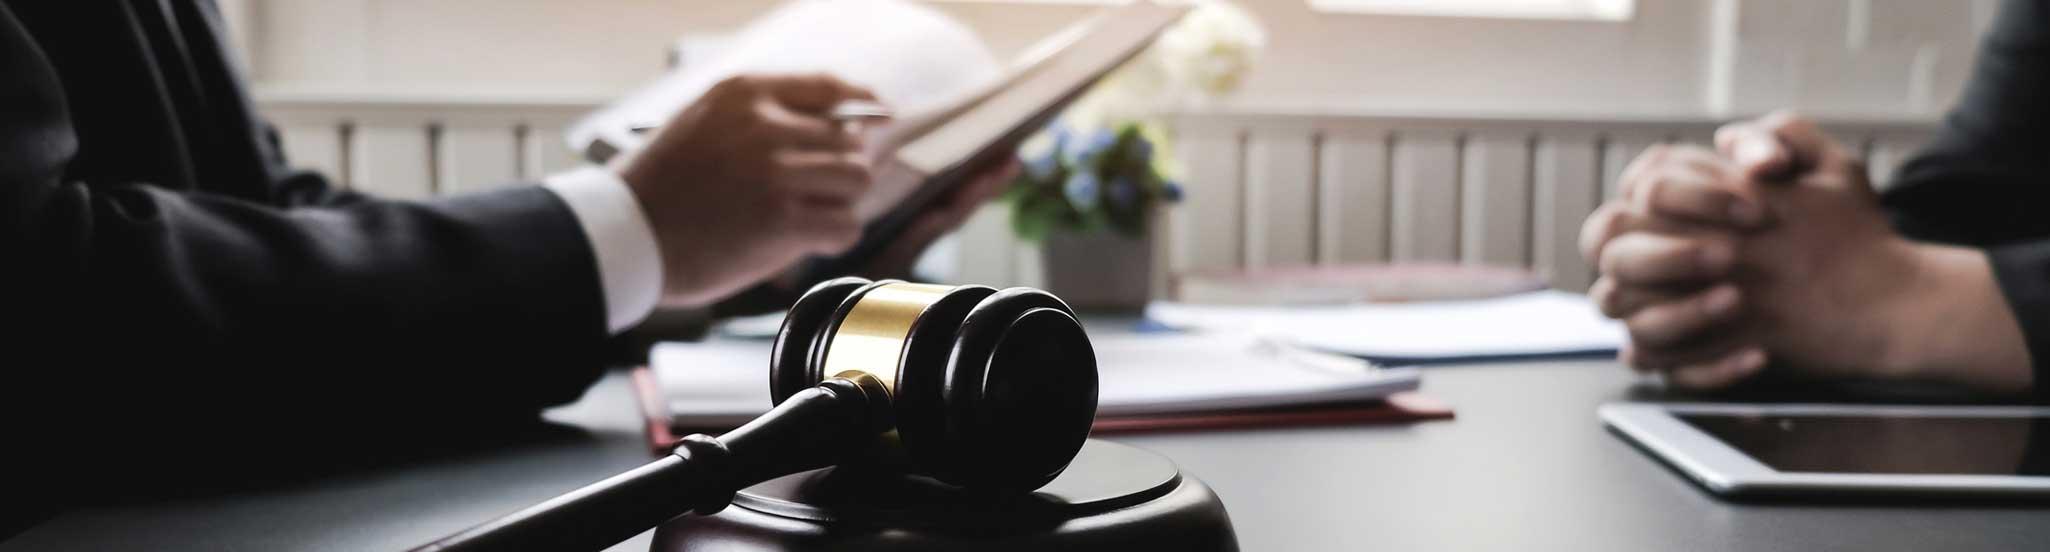 iowa sex offender registry clay county in Allentown